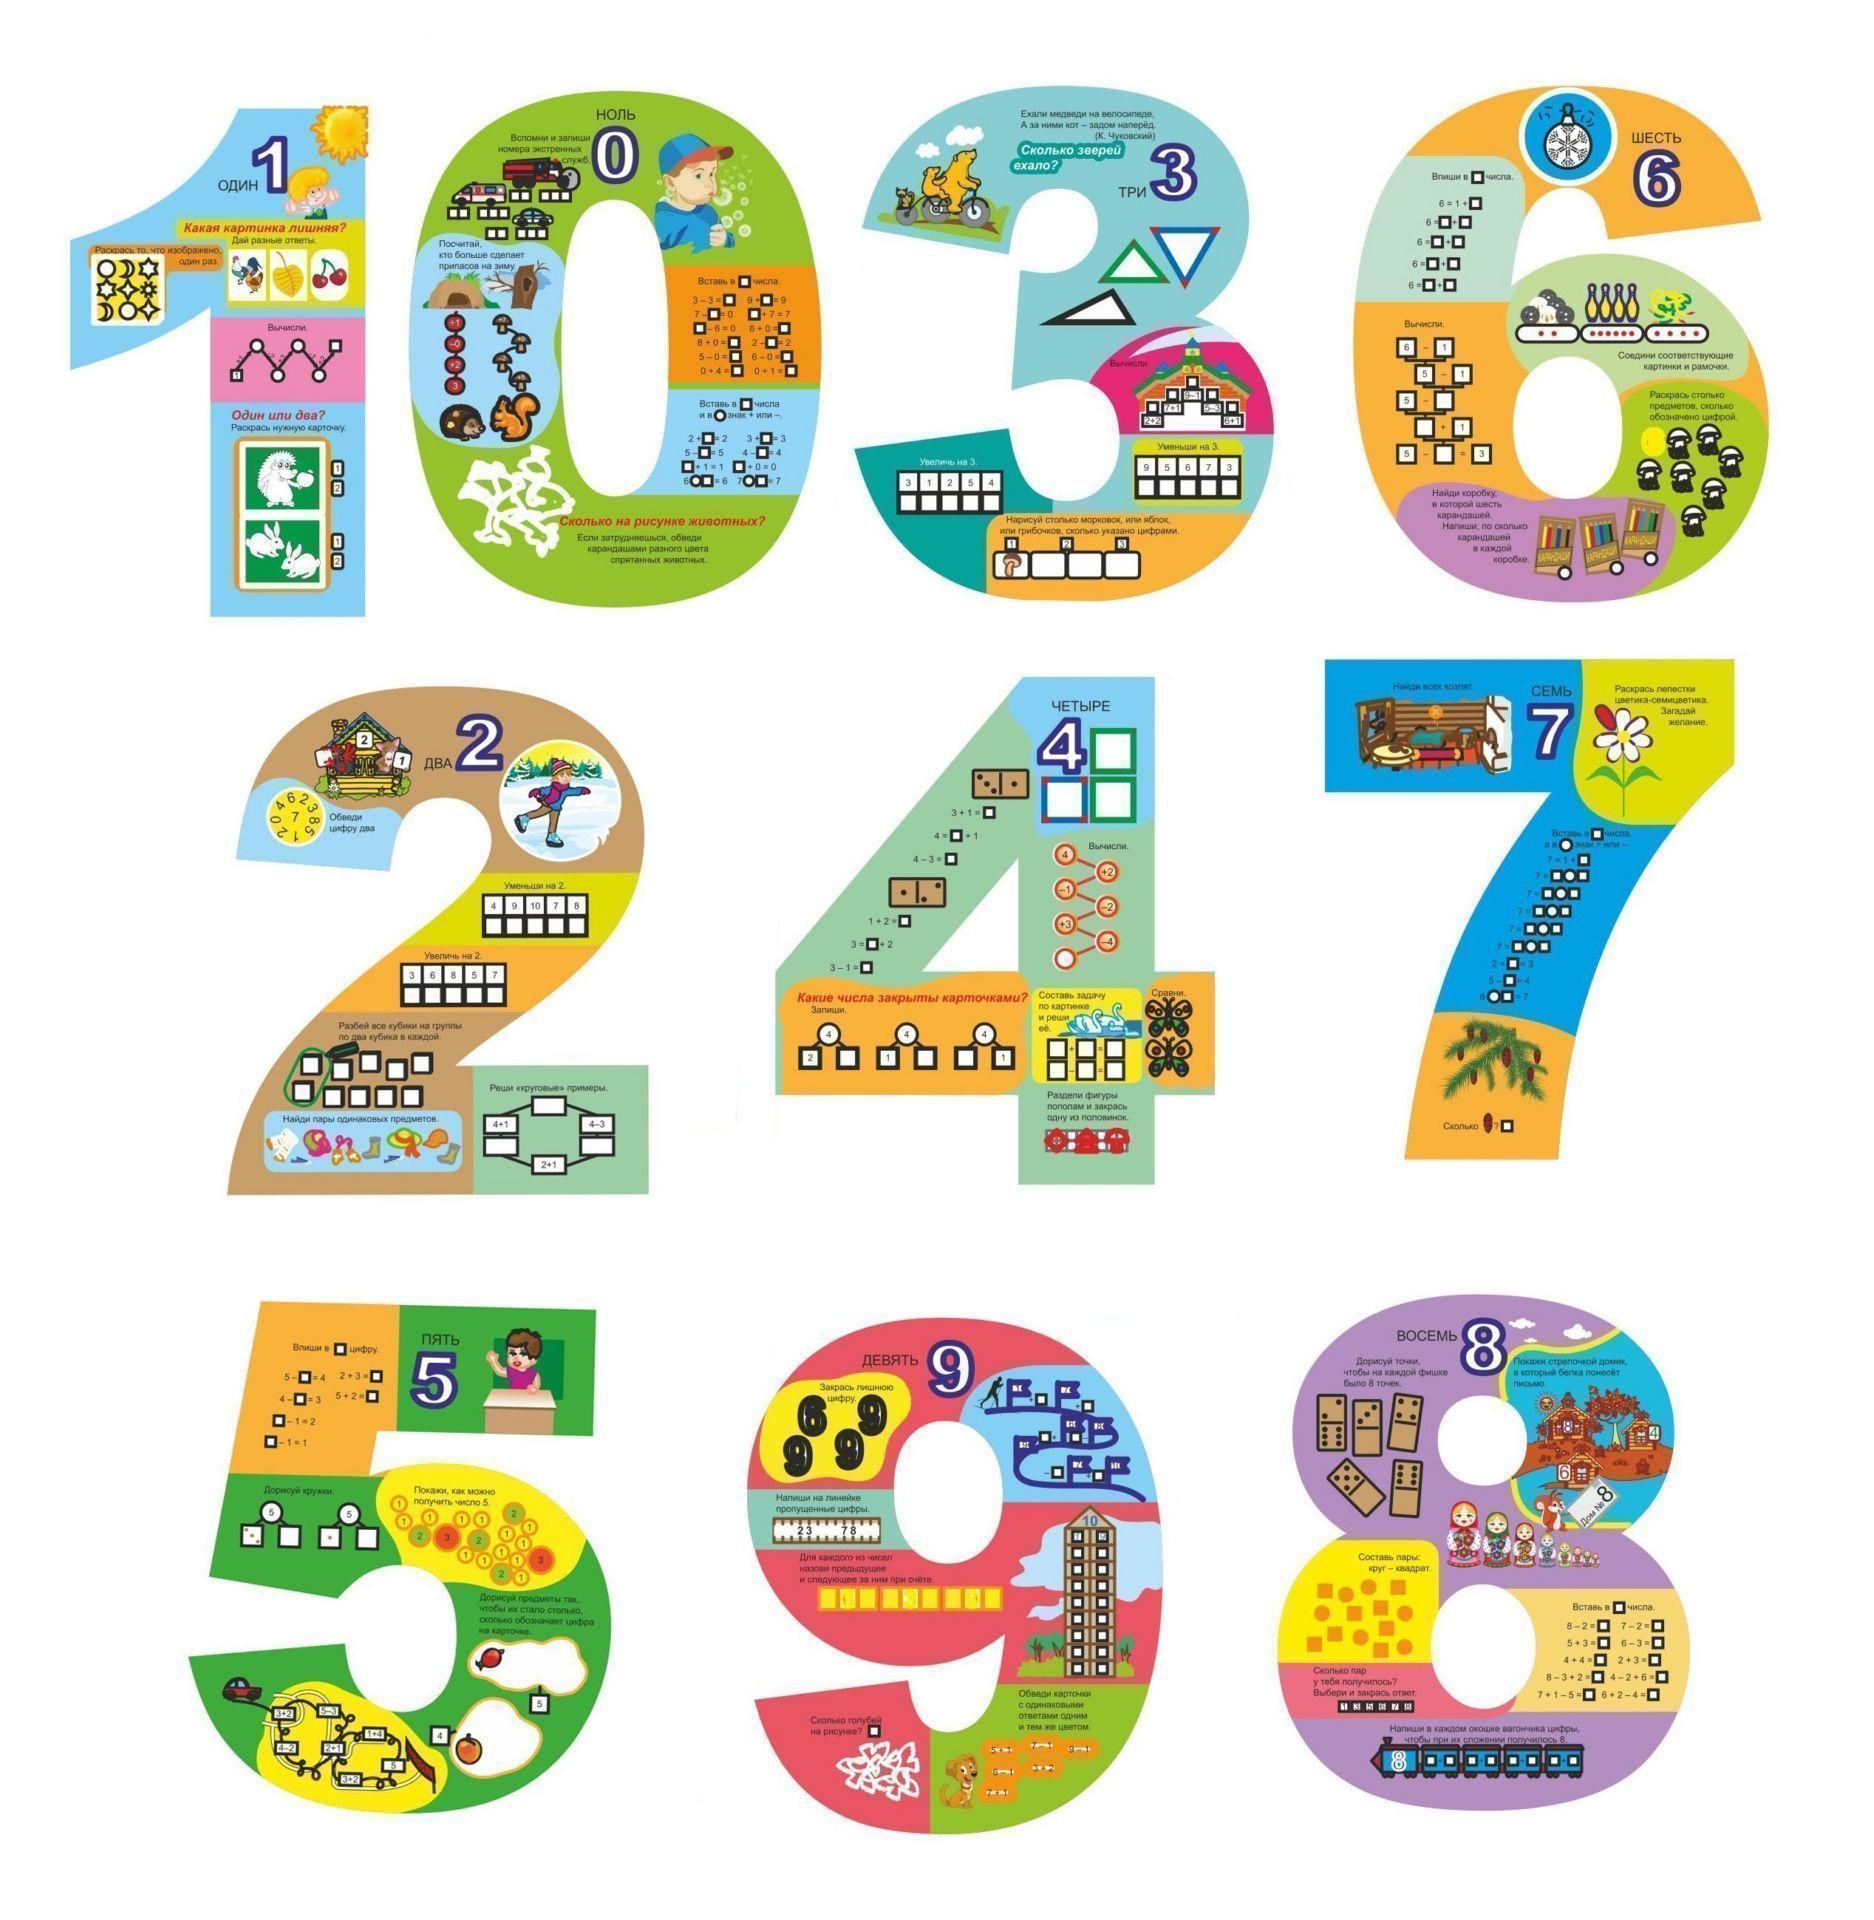 Двухсторонние цифры от 0 до 9 с развивающими заданиями, примерами, прописями